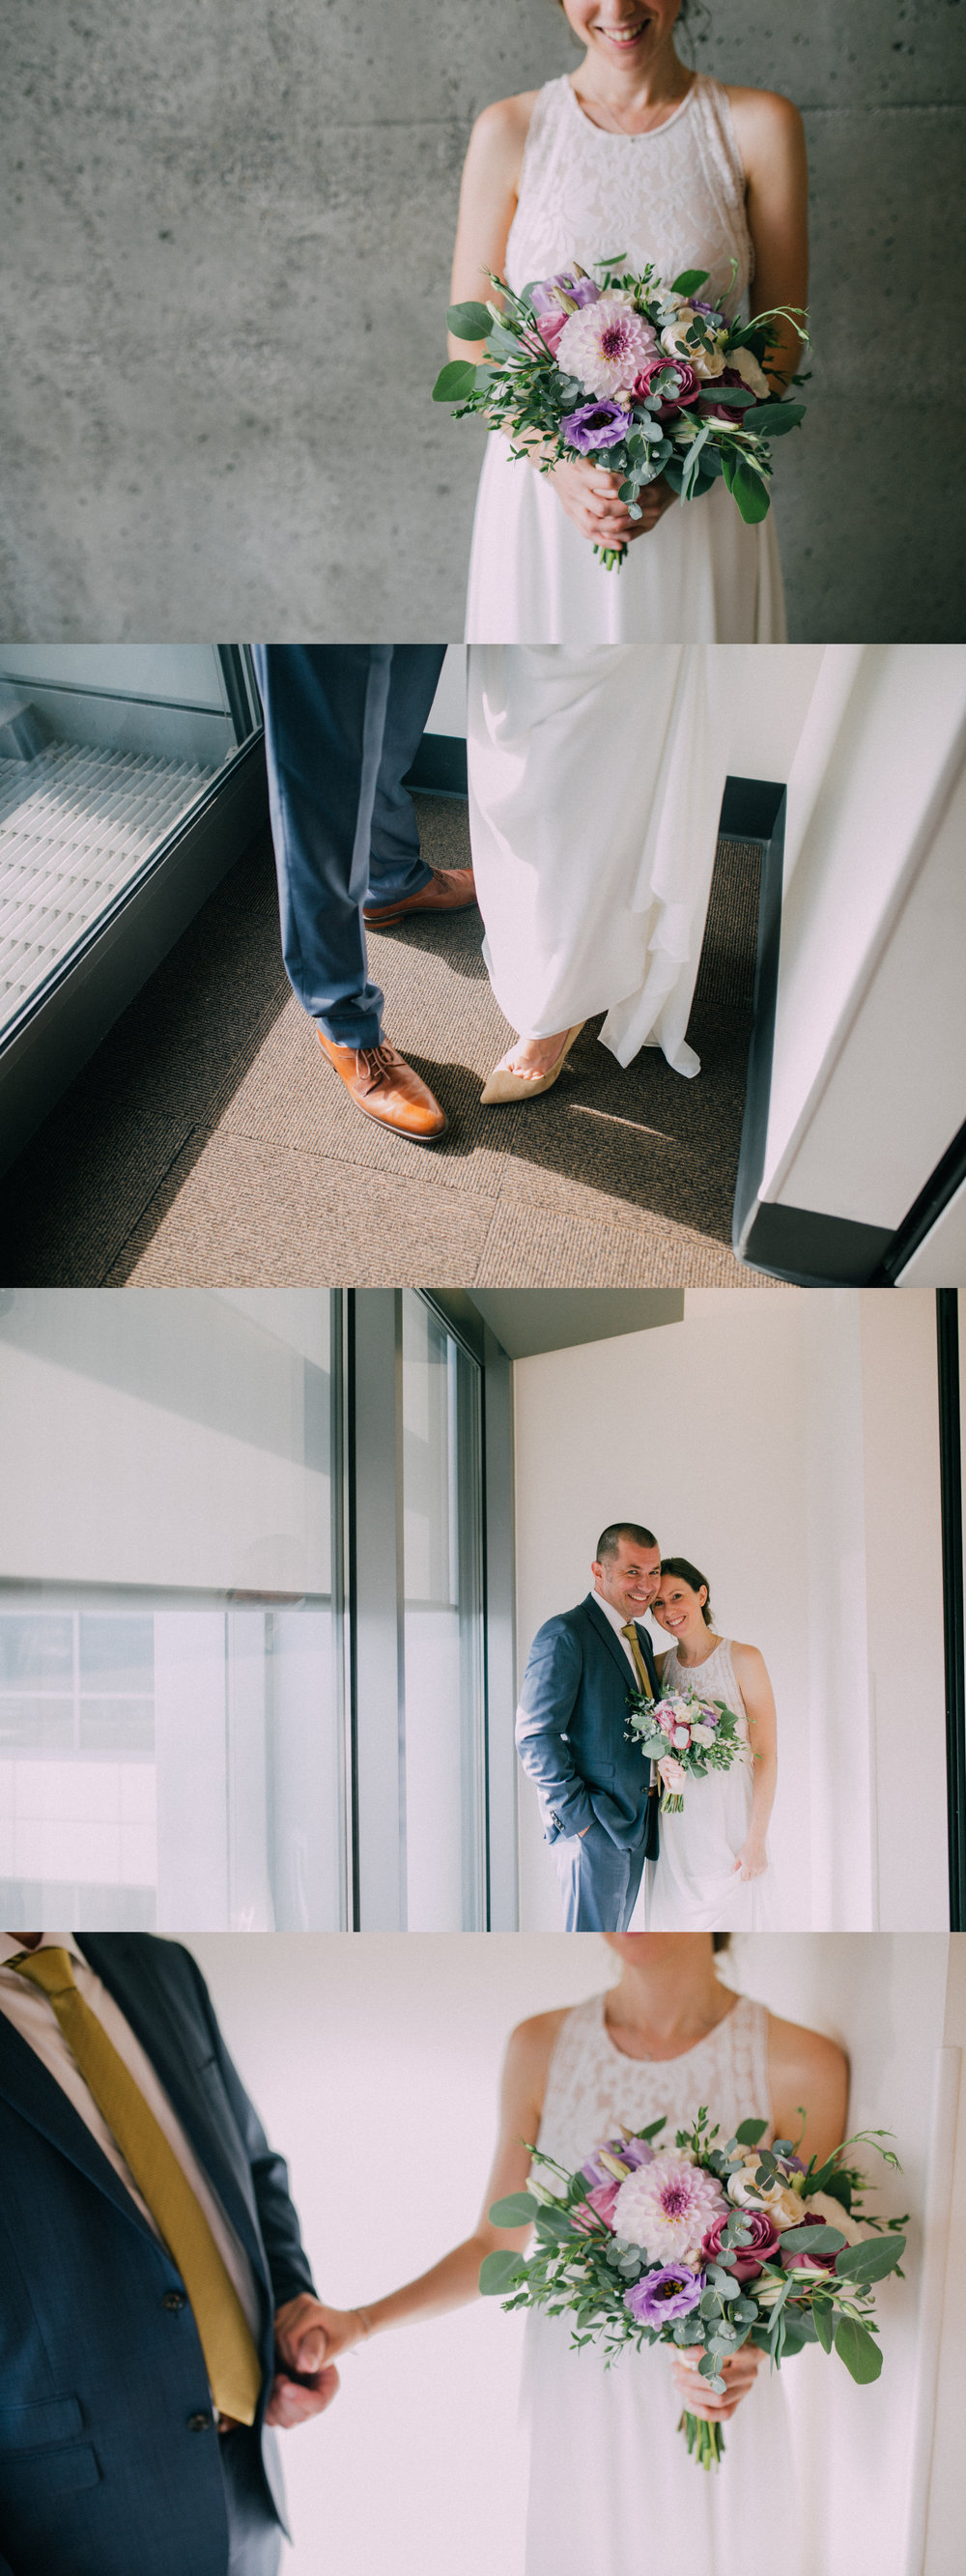 seattle courthouse wedding photographer elopement washington state-7.jpg